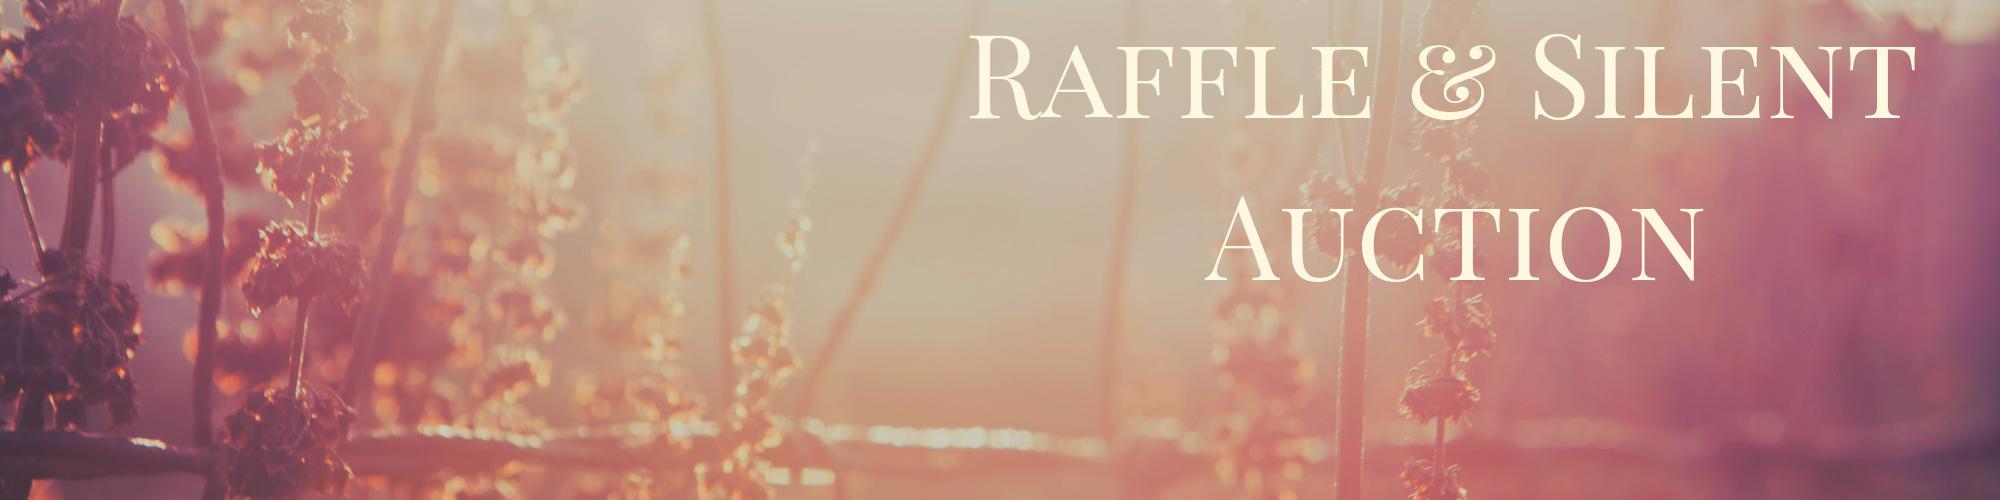 Raffle Prizes & Silent Auction Lots  